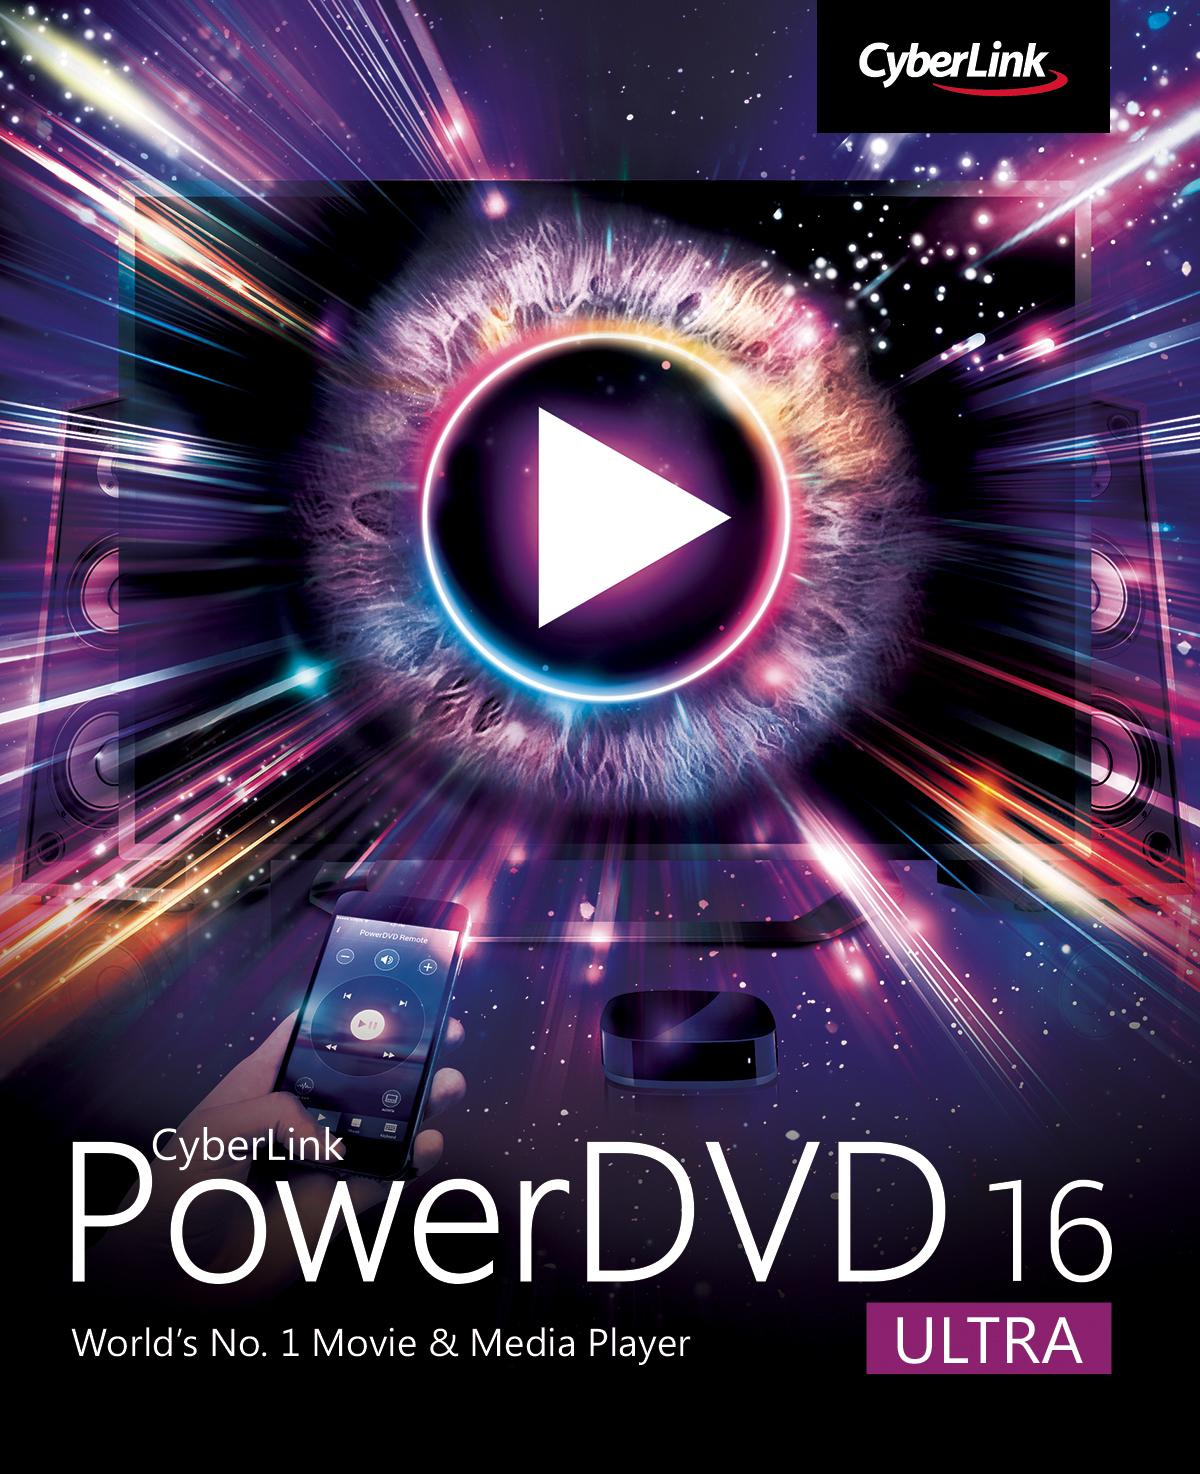 powerdvd 16 torrent